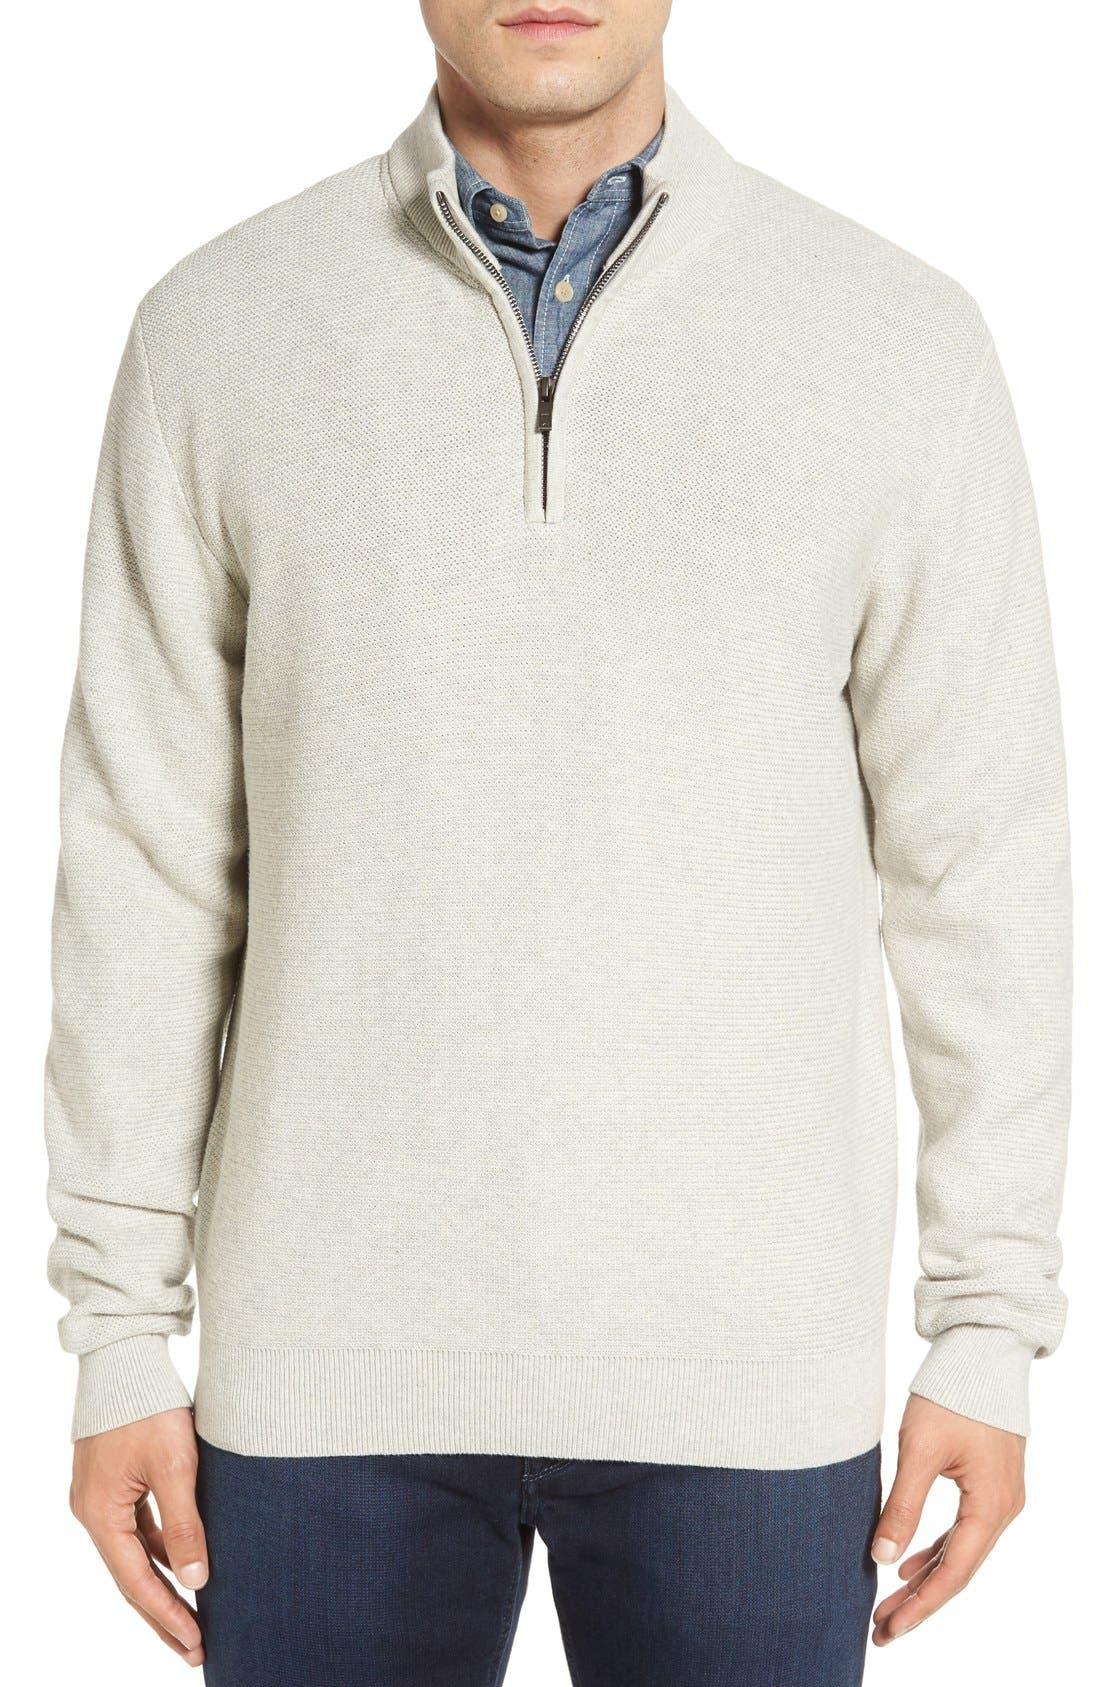 'Benson' Quarter Zip Textured Knit Sweater,                         Main,                         color,